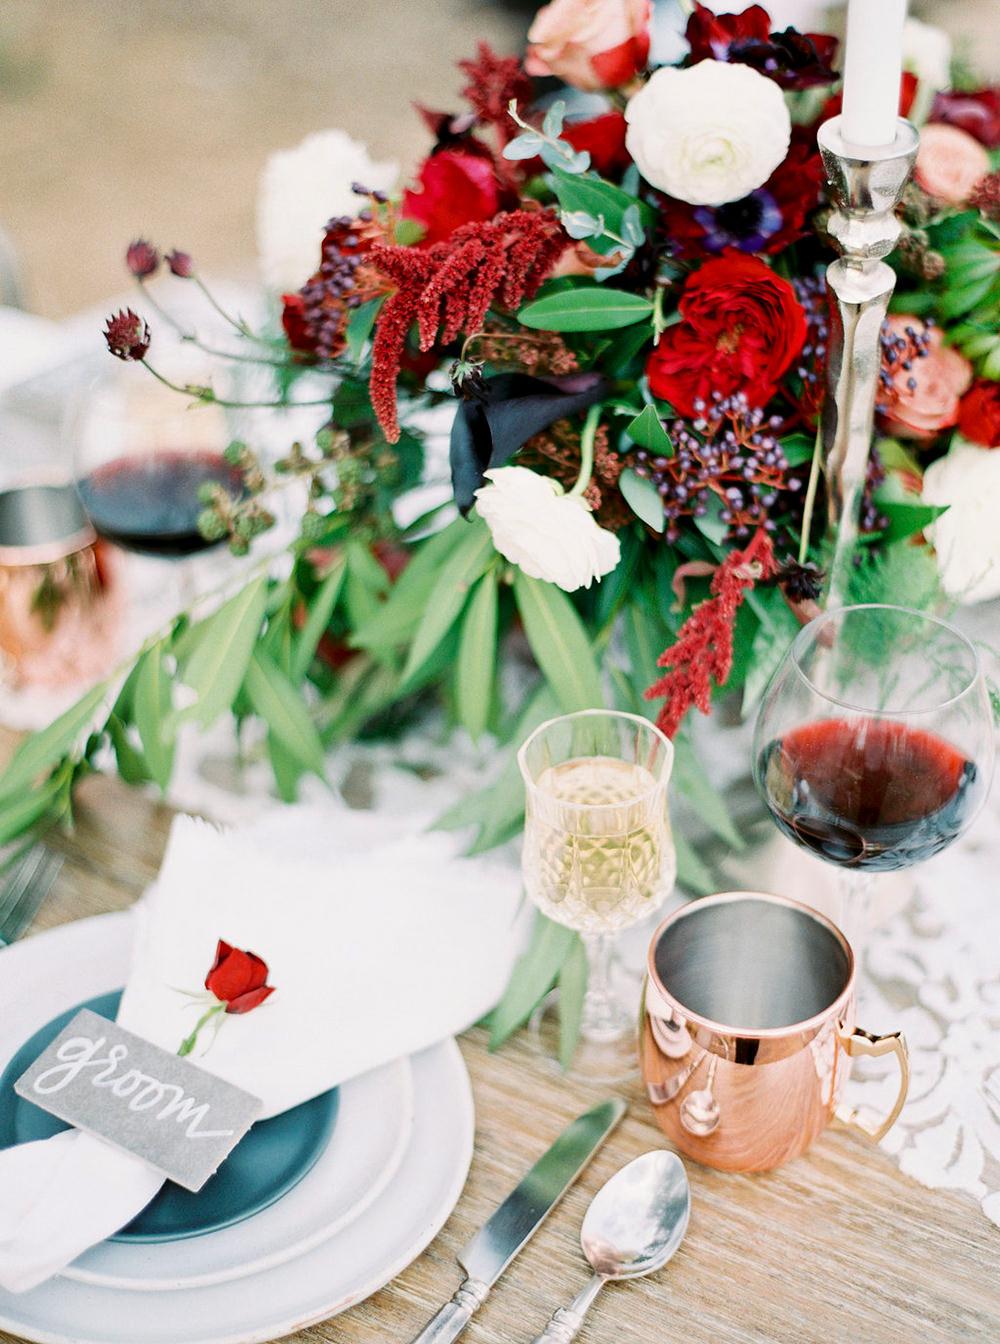 romantic red and green centerpieces - photo by Amanda Lenhardt https://ruffledblog.com/relaxed-san-juan-capistrano-wedding-inspiration